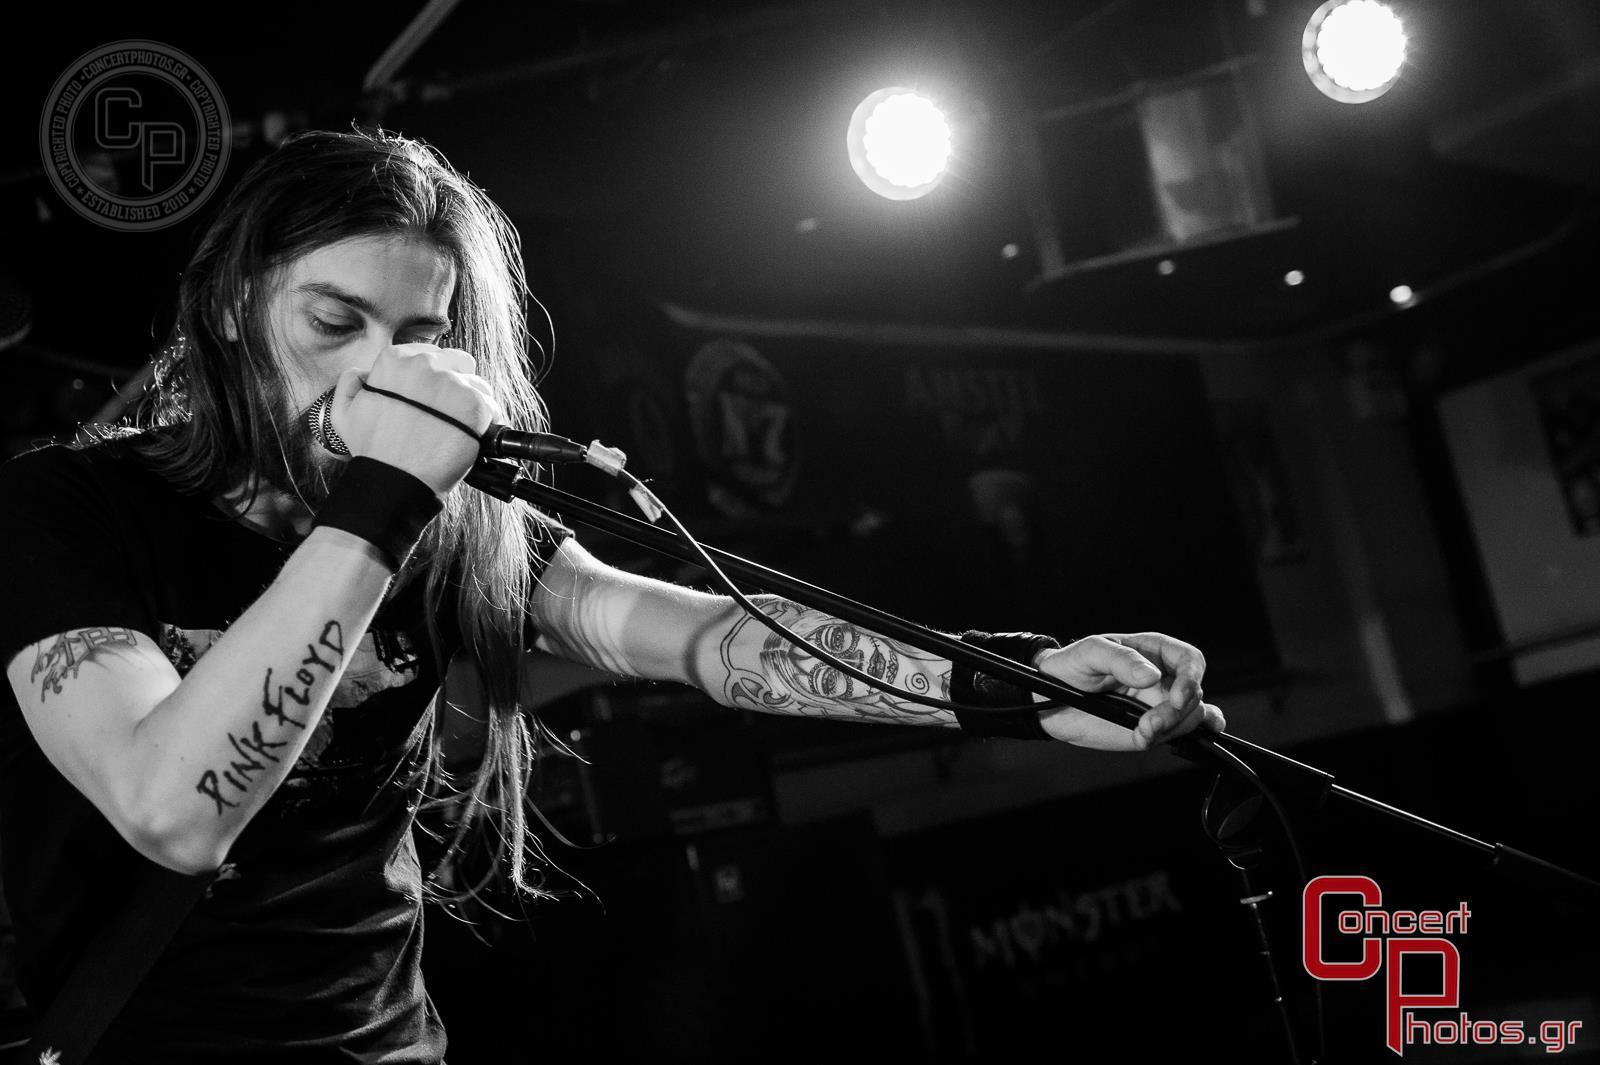 Battle Of The Bands Leg 1-Battle Of The Bands Leg 1 photographer:  - ConcertPhotos - 20141127_0026_58